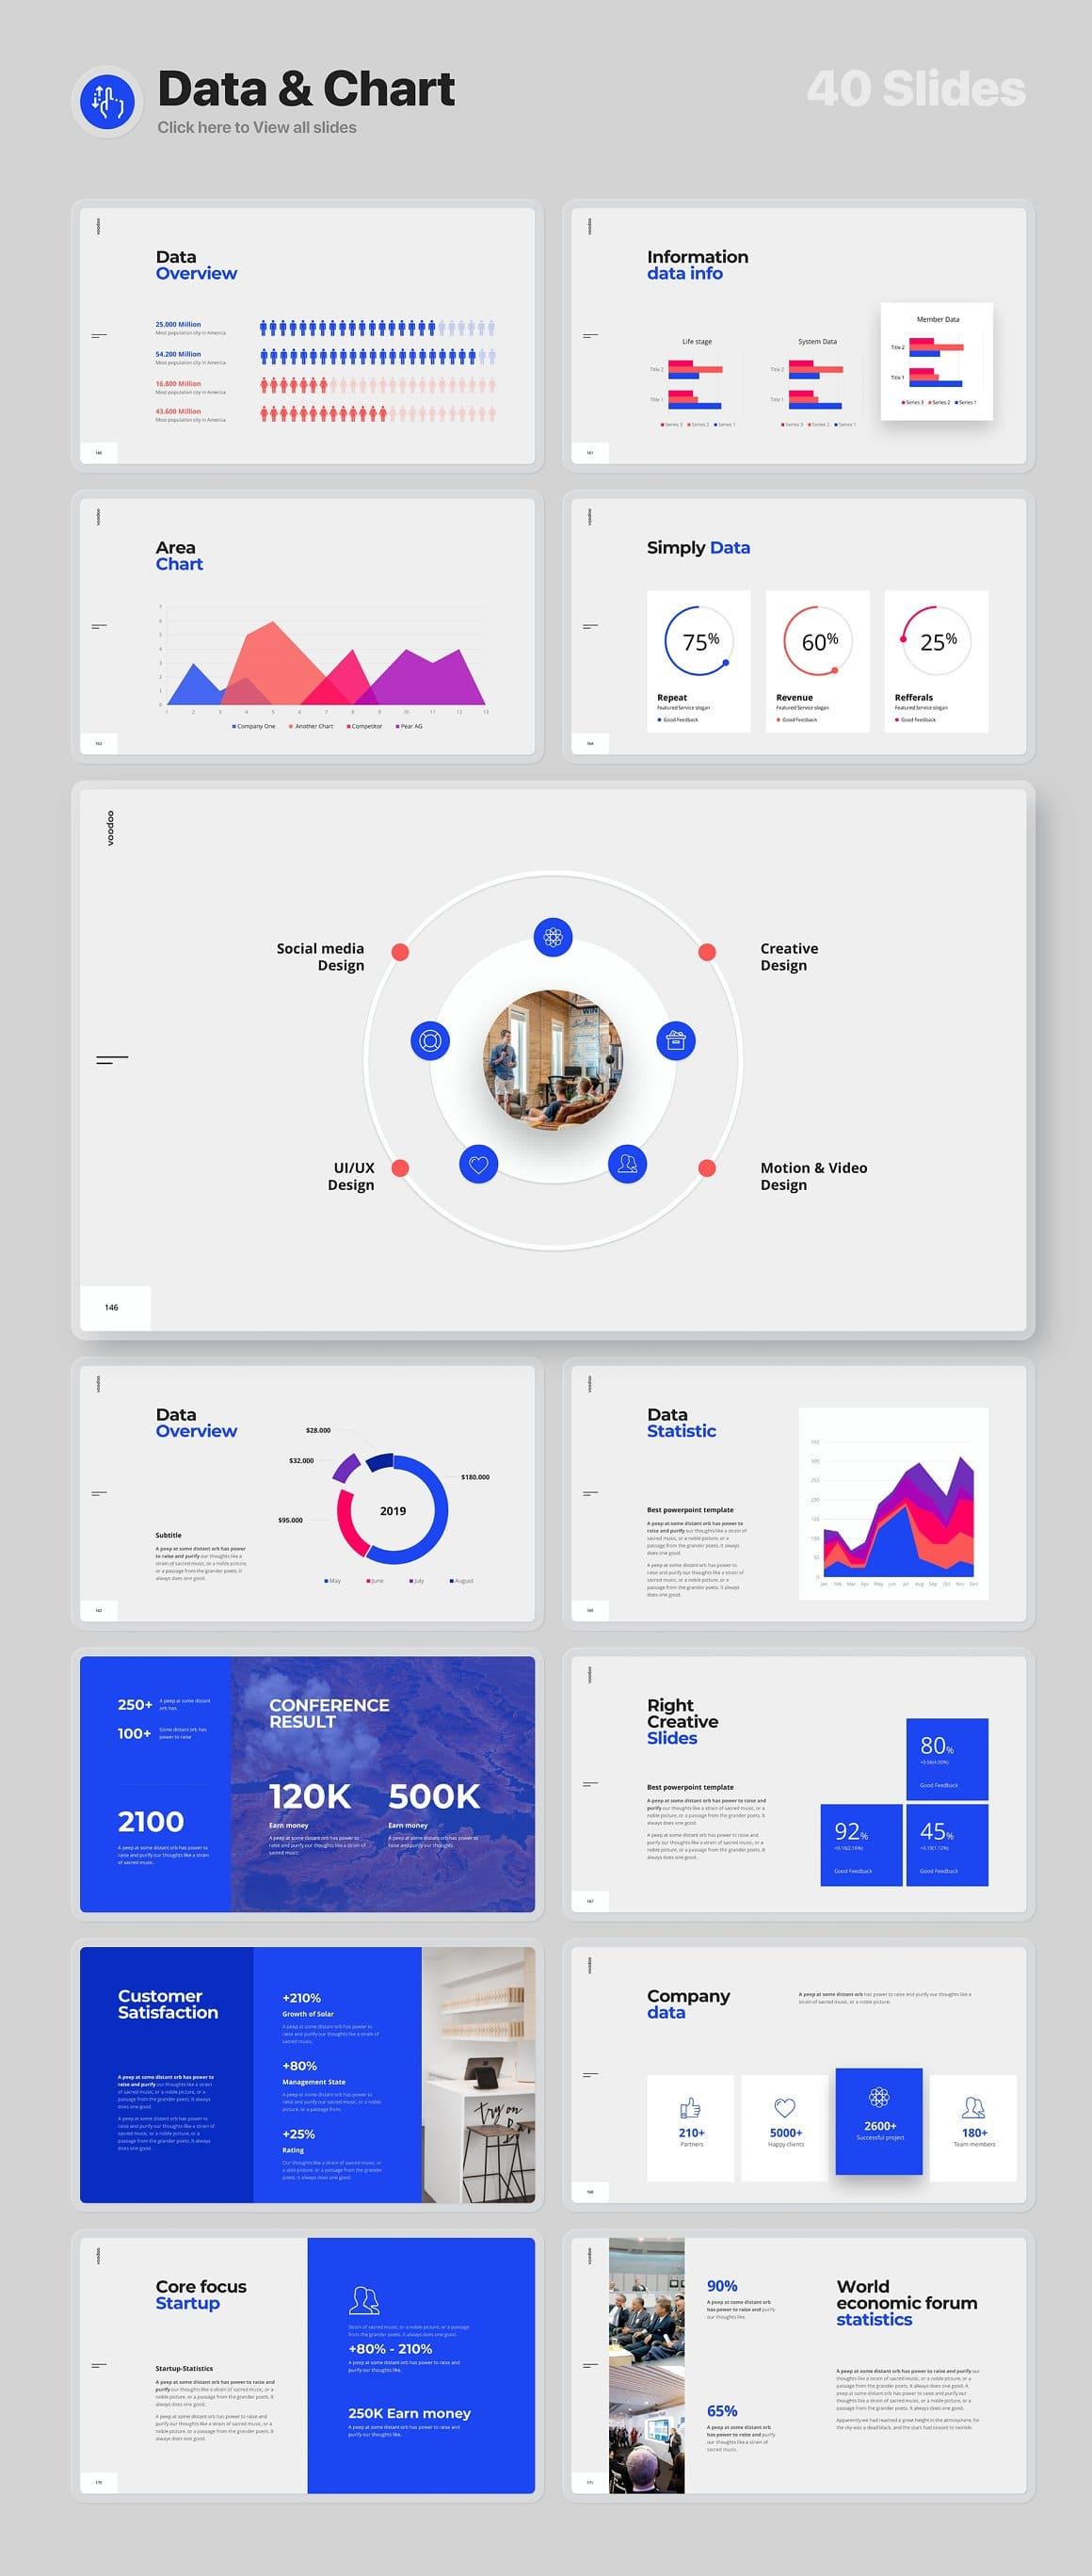 40 Slides Data and Chart Part 2 Voodoo Presentation 4.0.